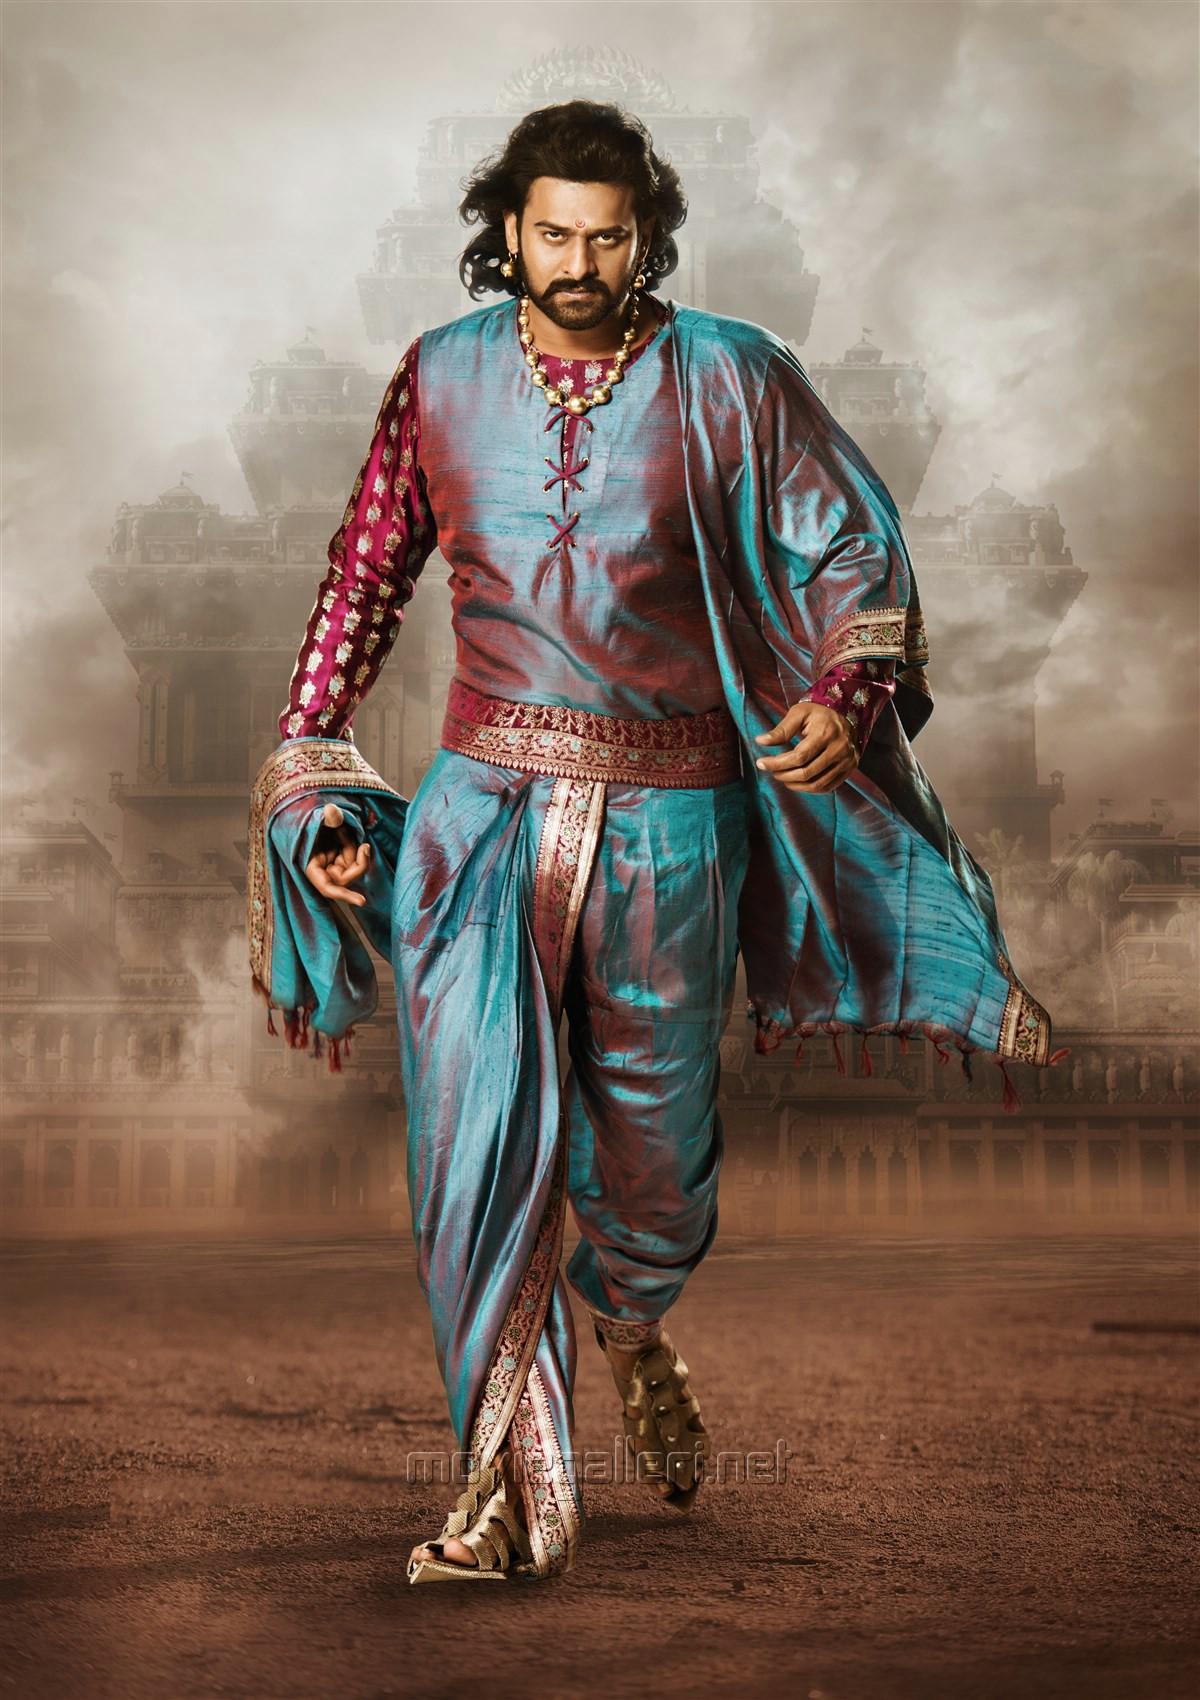 Baahubali 2 Actor Prabhas New Images HD